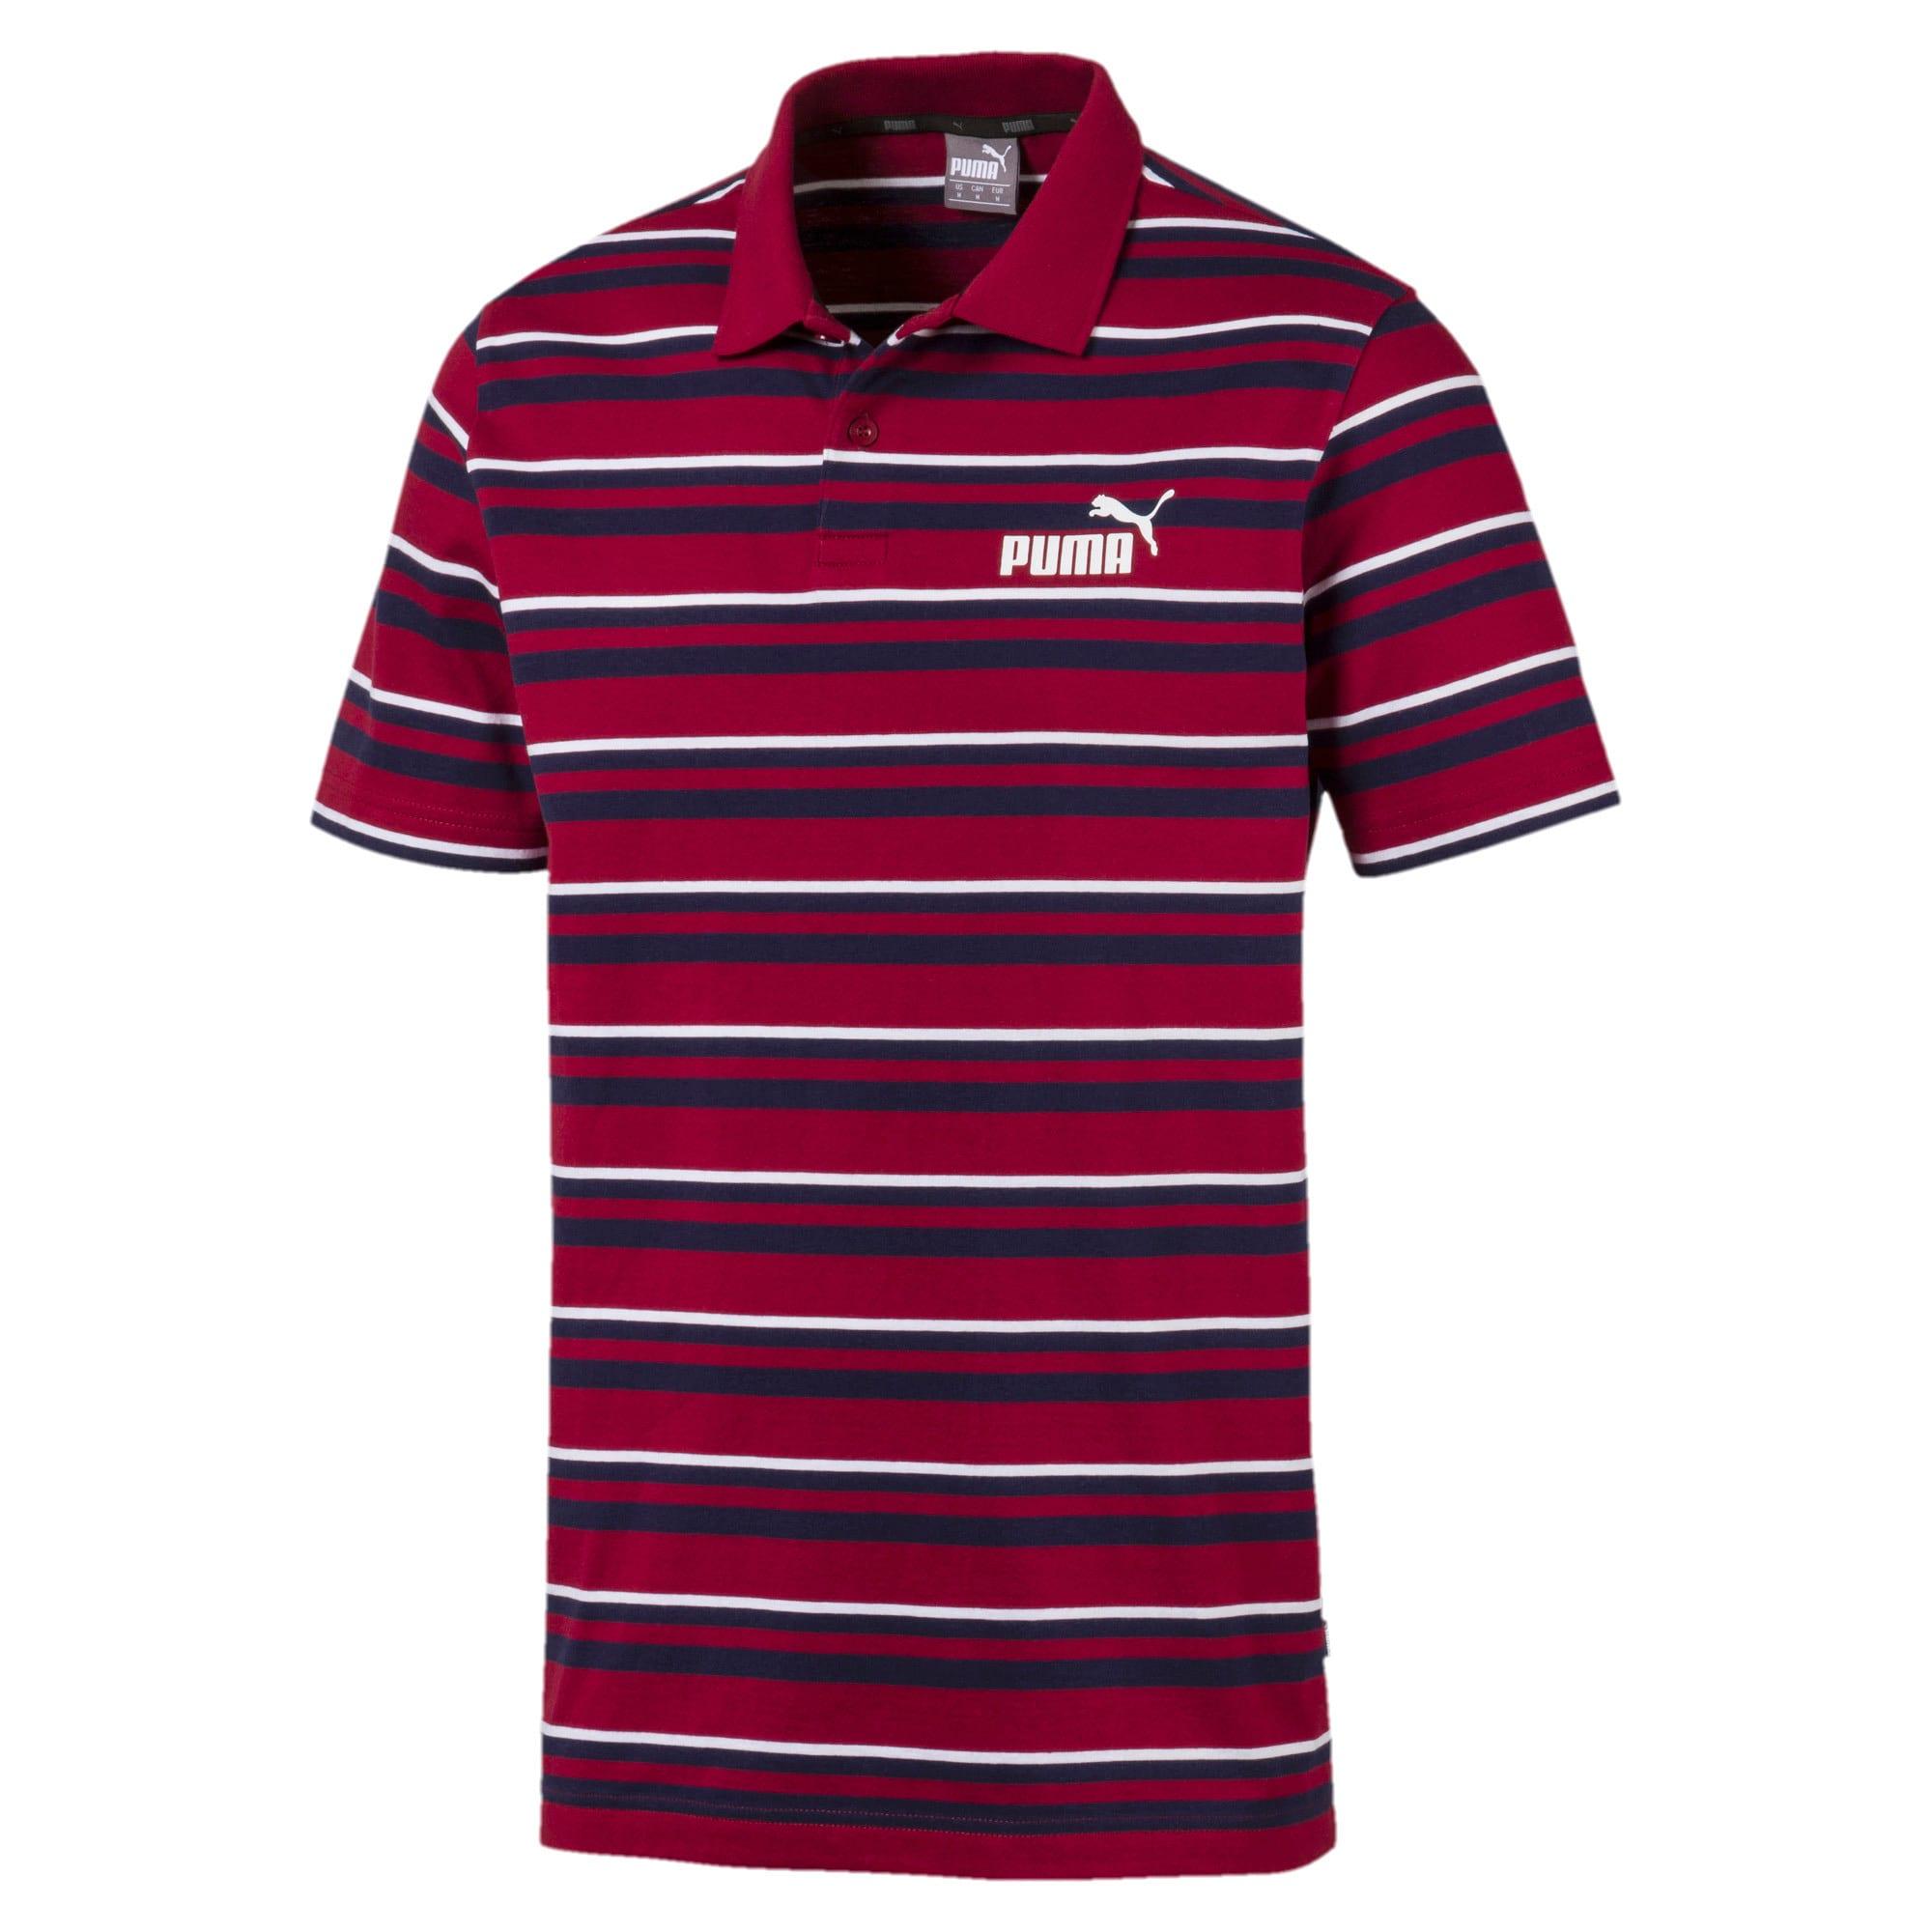 Thumbnail 1 of ESS+ Striped J Men's Polo, Rhubarb, medium